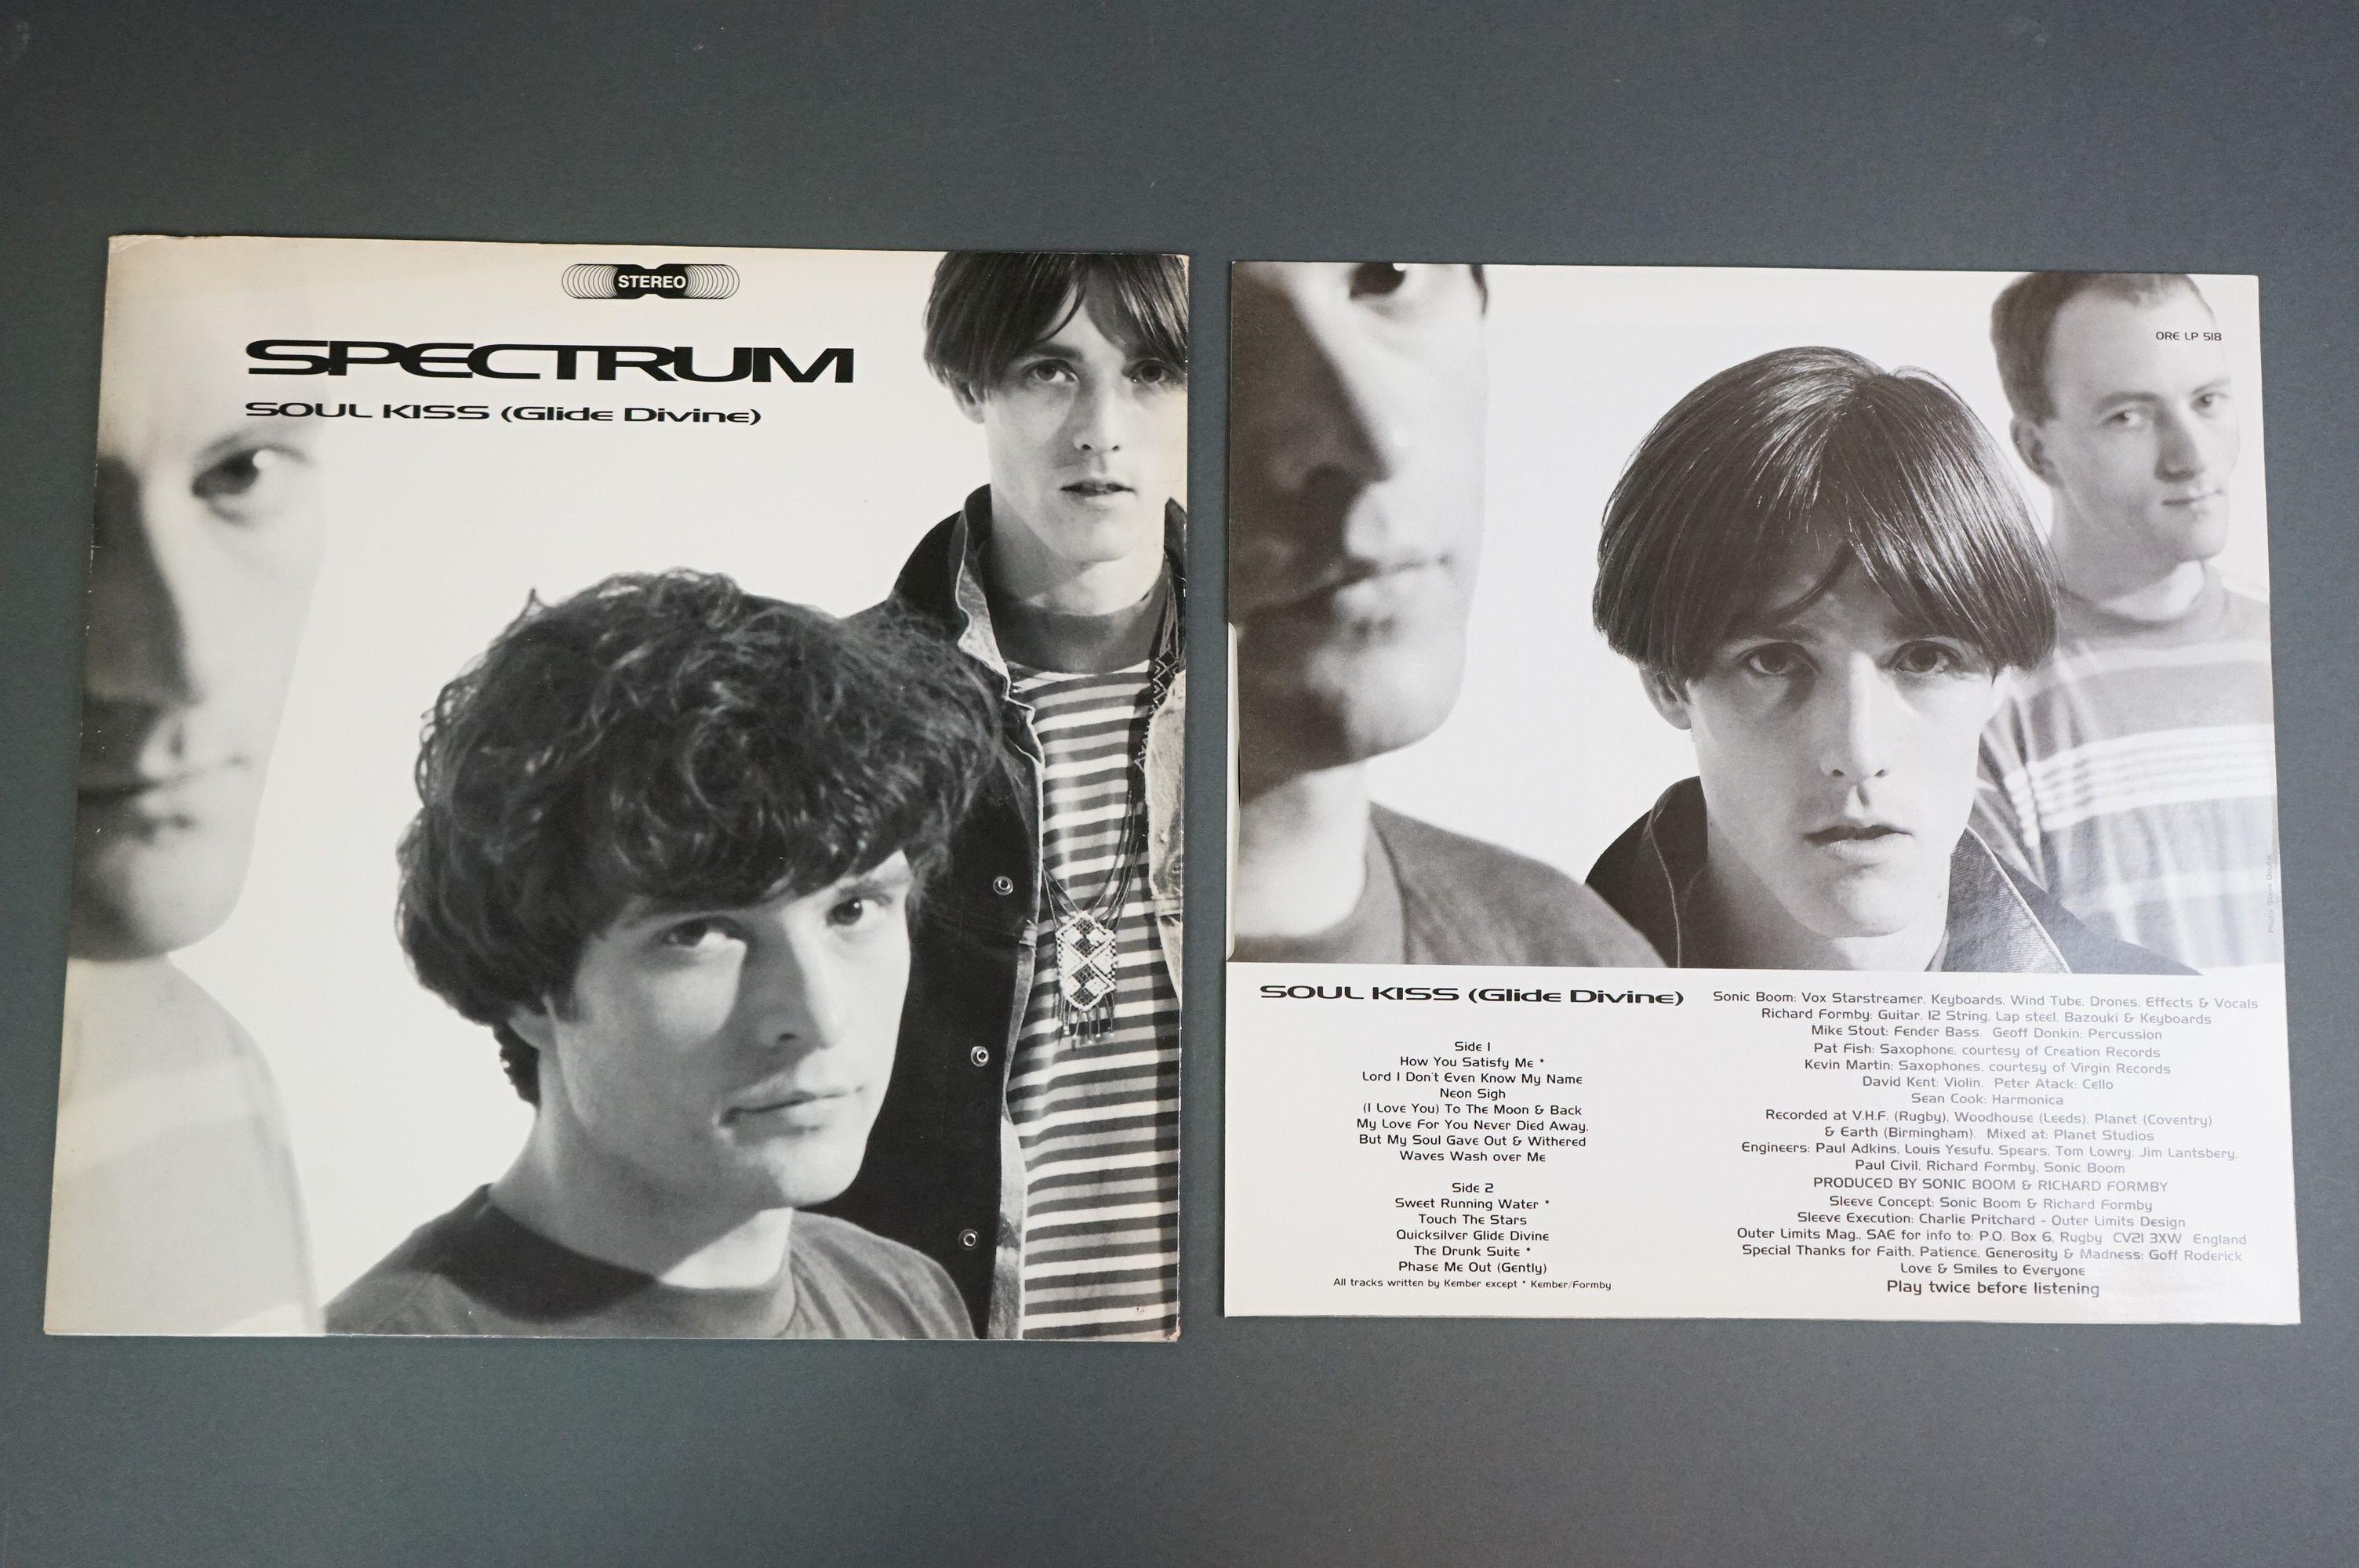 Vinyl - Spectrum Soul Kiss (Glide Devine) ORE LP 518 on Silvertone Records, original inner with - Image 2 of 6